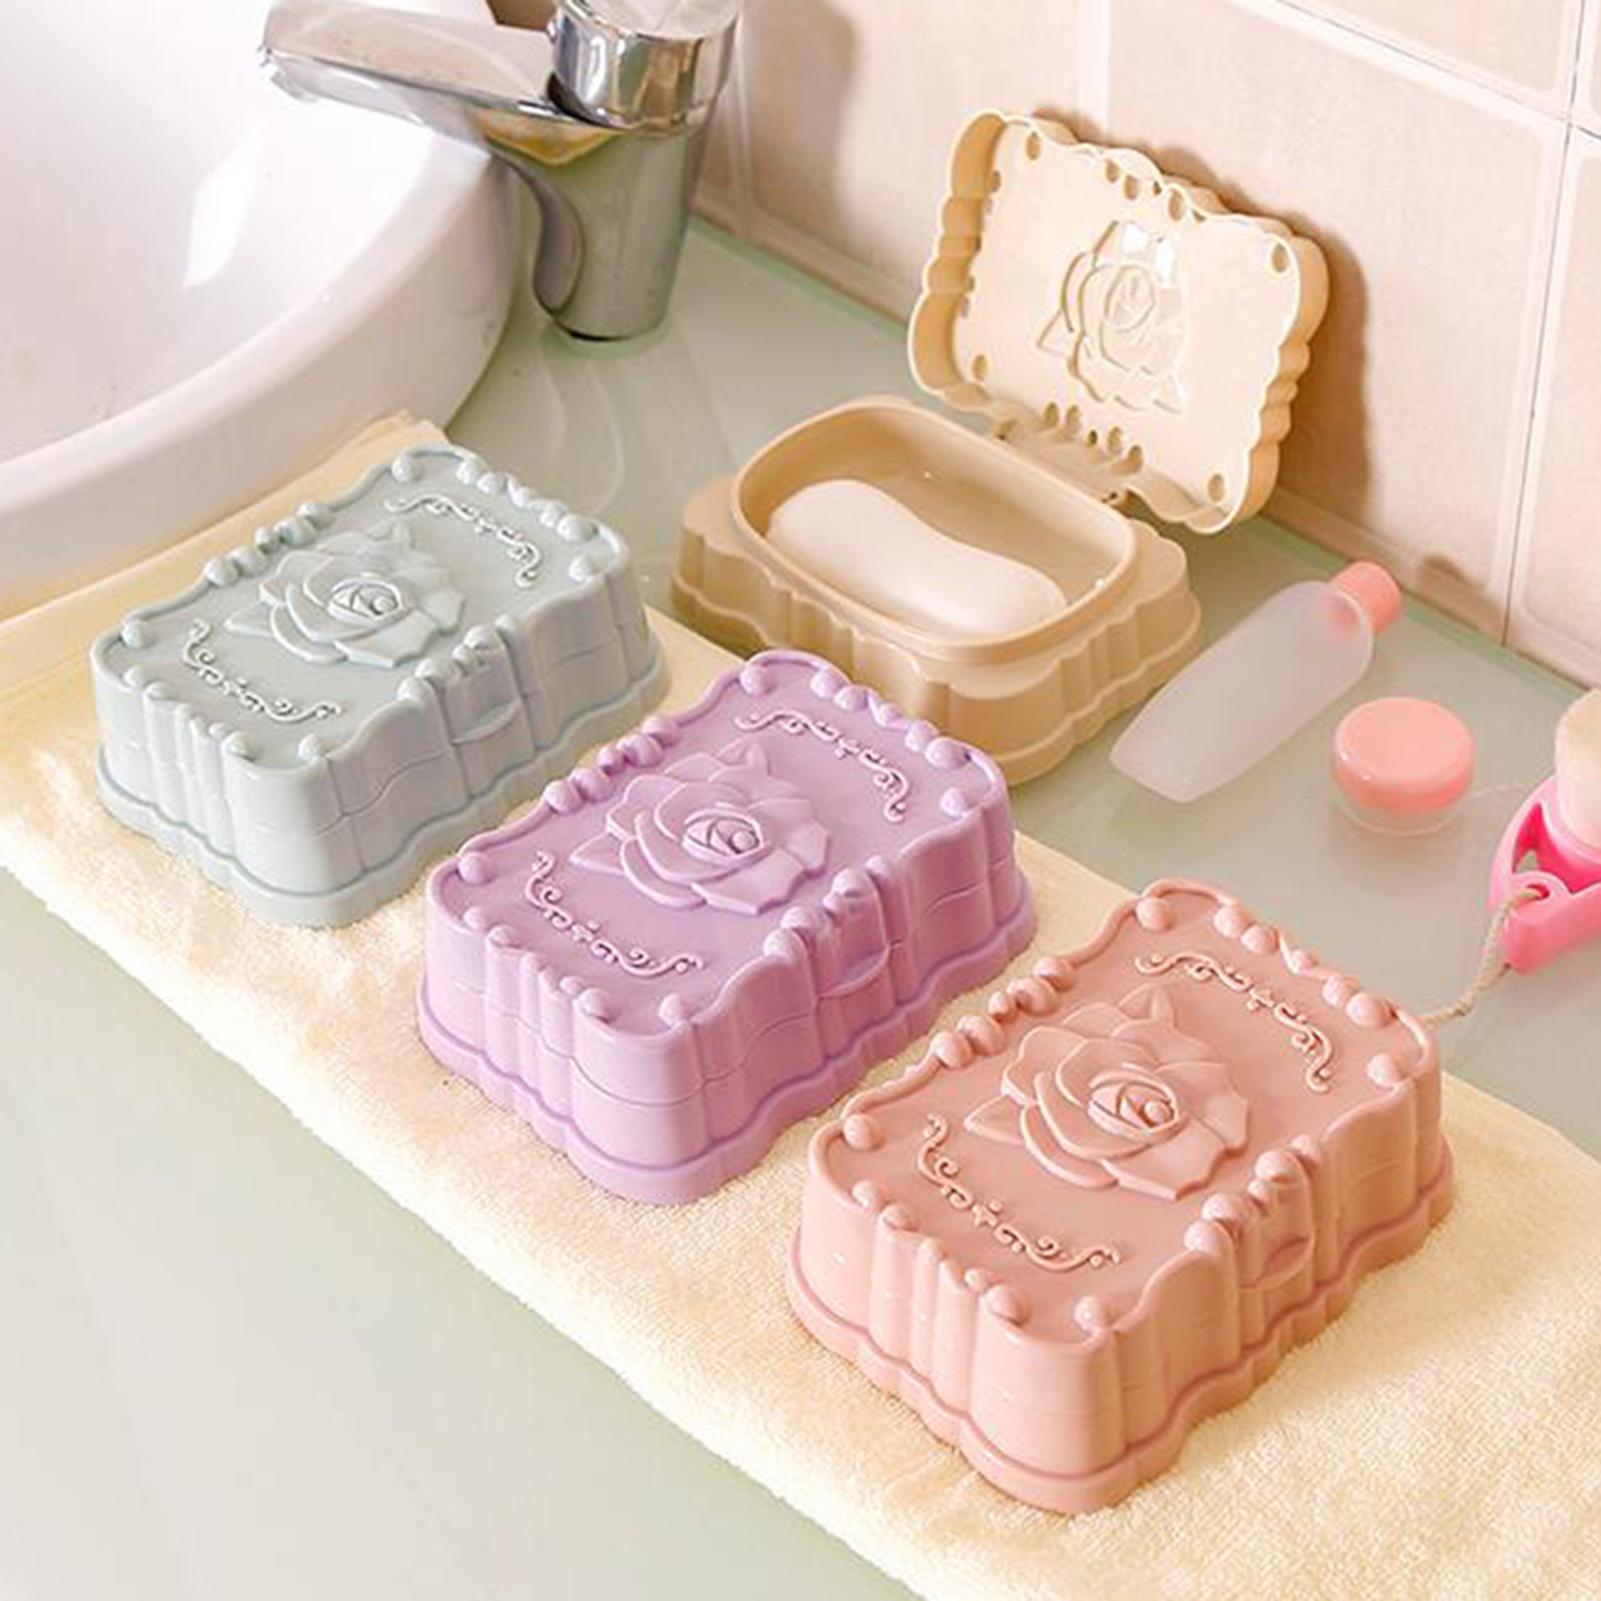 Modern Plastic Rose Bathroom Soap Storage Dish Drain Rack Holder Container Case